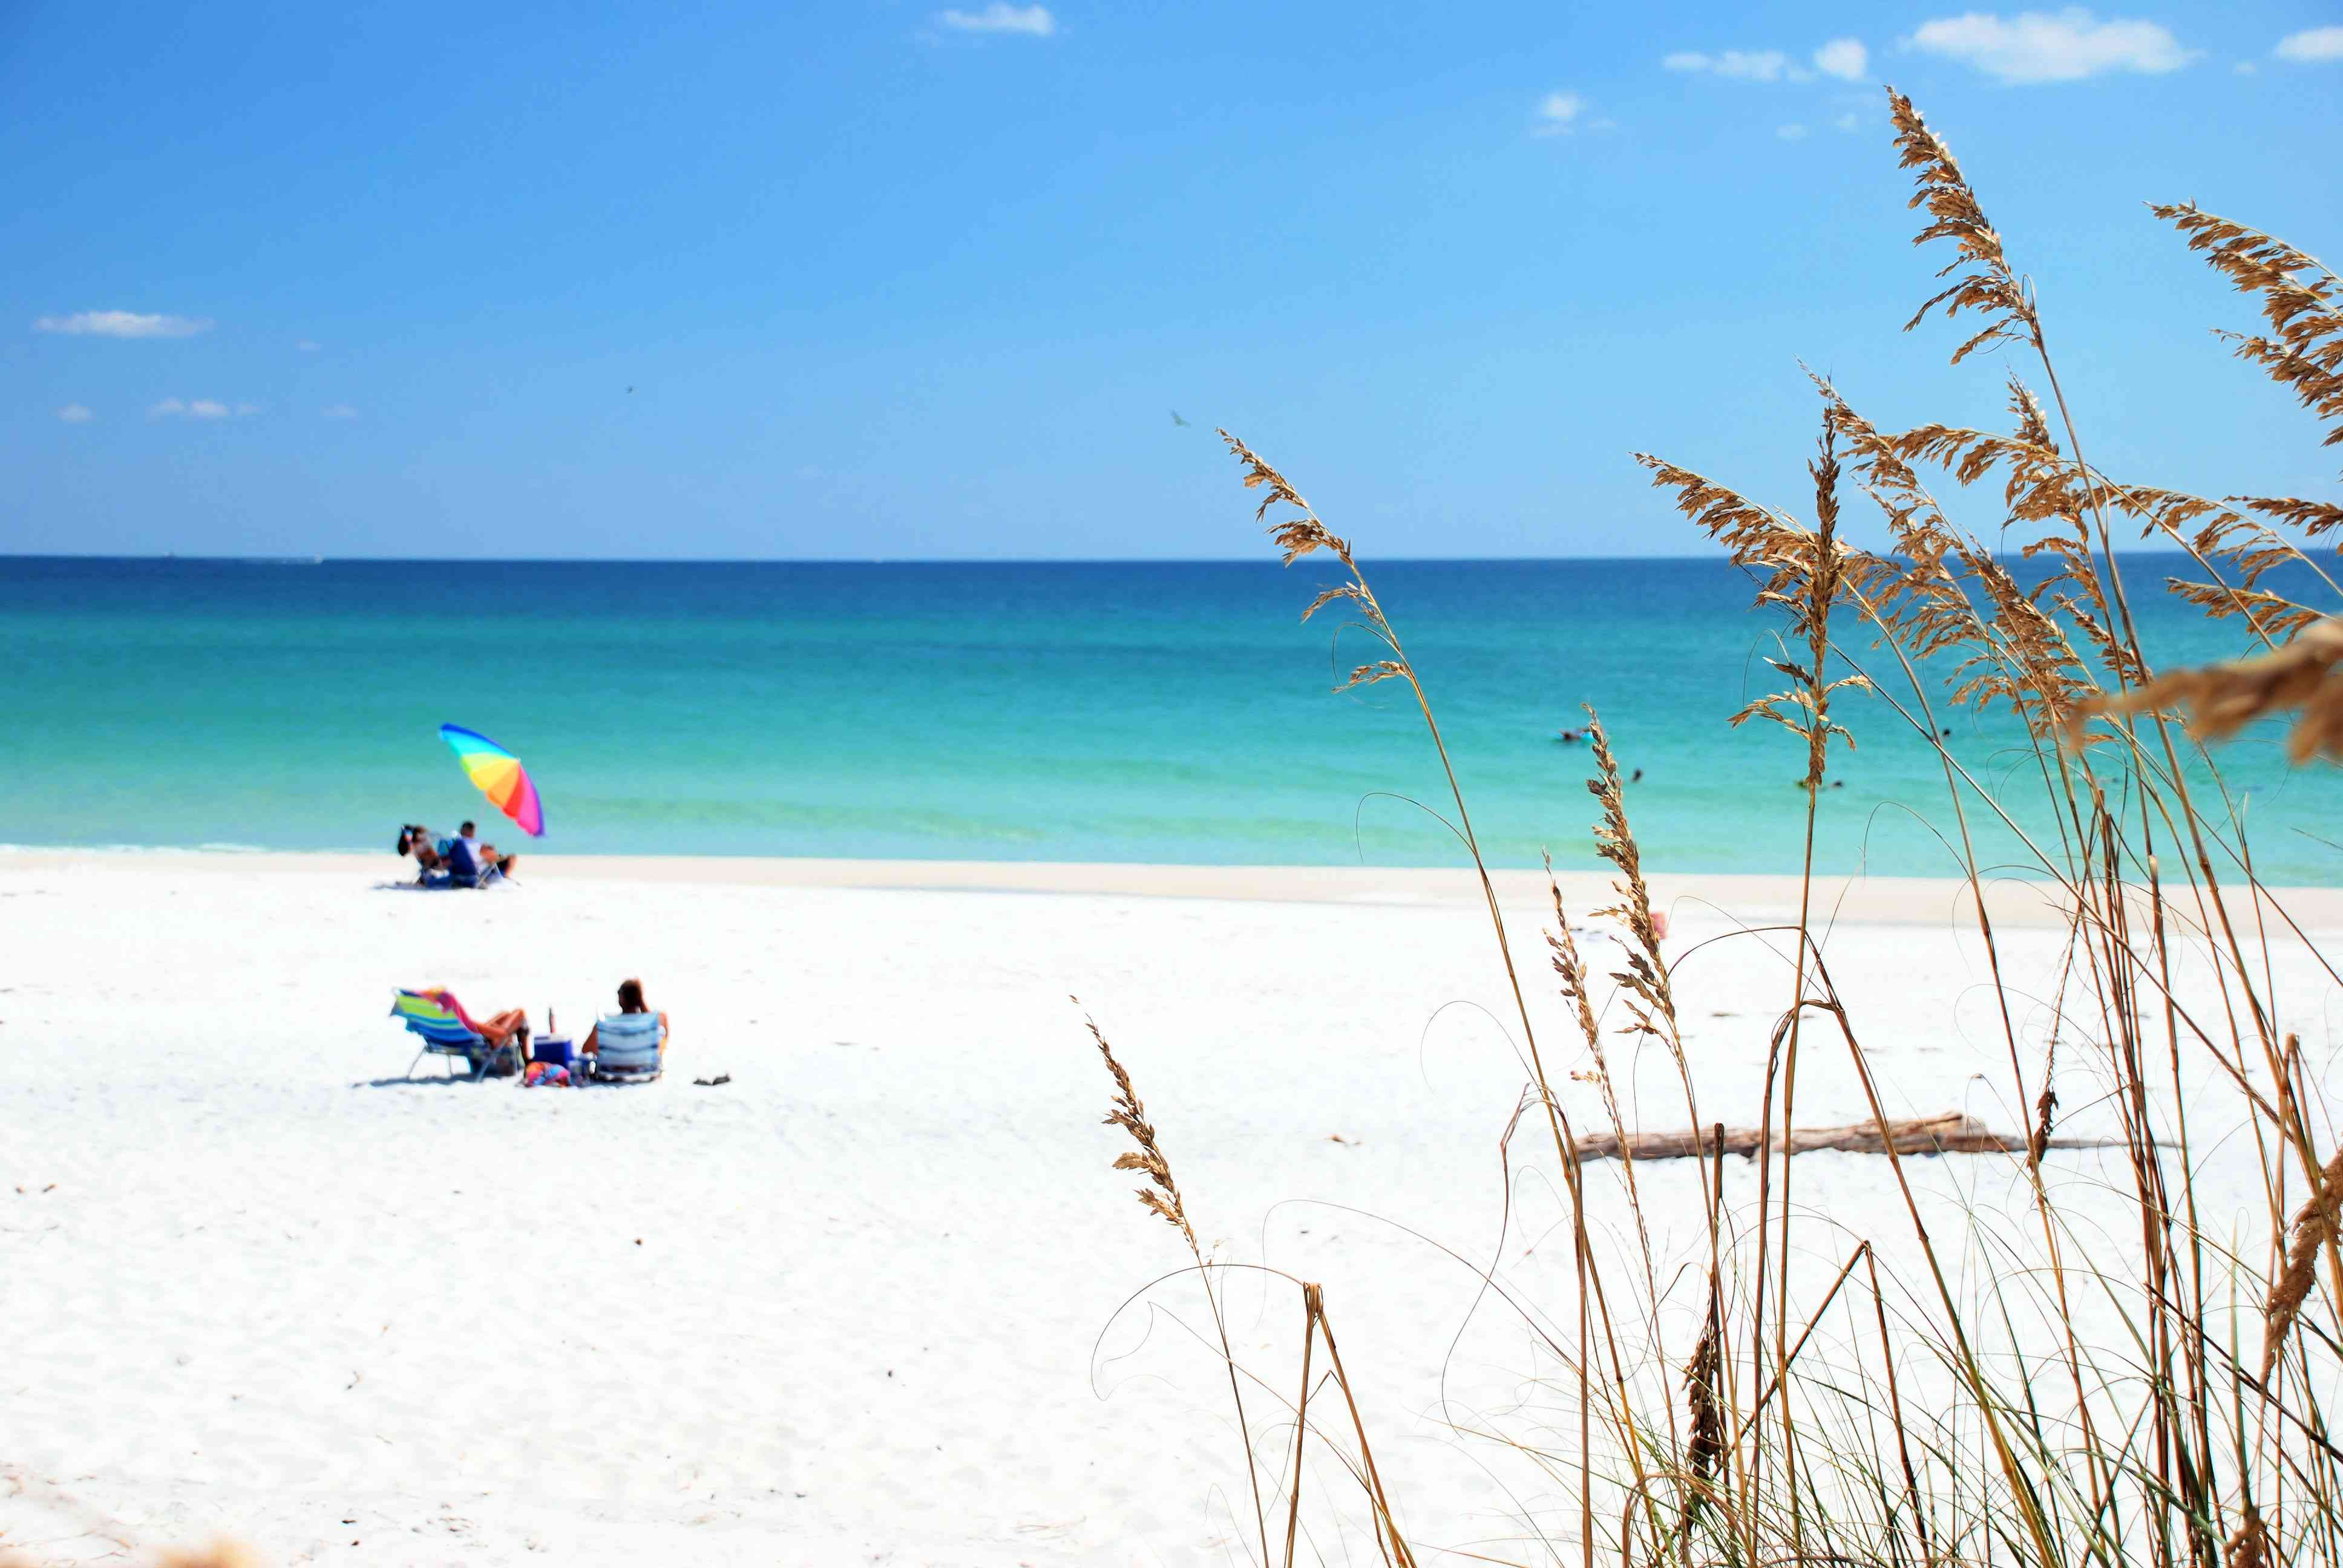 Beach goers enjoying white sand and emerald water of Destin, Florida